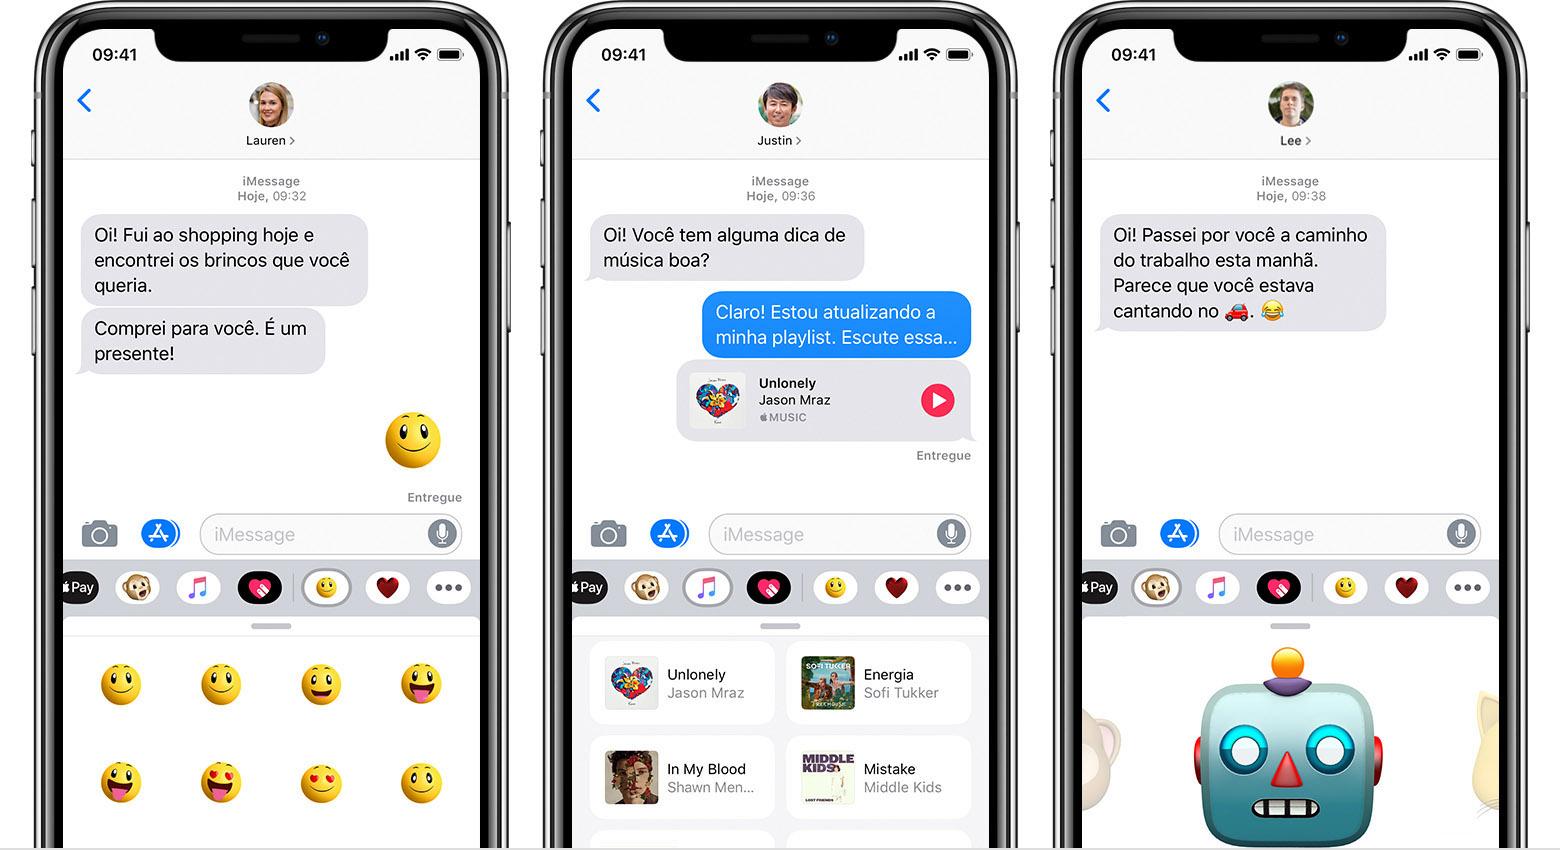 Usar os apps do iMessage no iPhone, iPad e iPod touch - Suporte da Apple f6bdc64bab